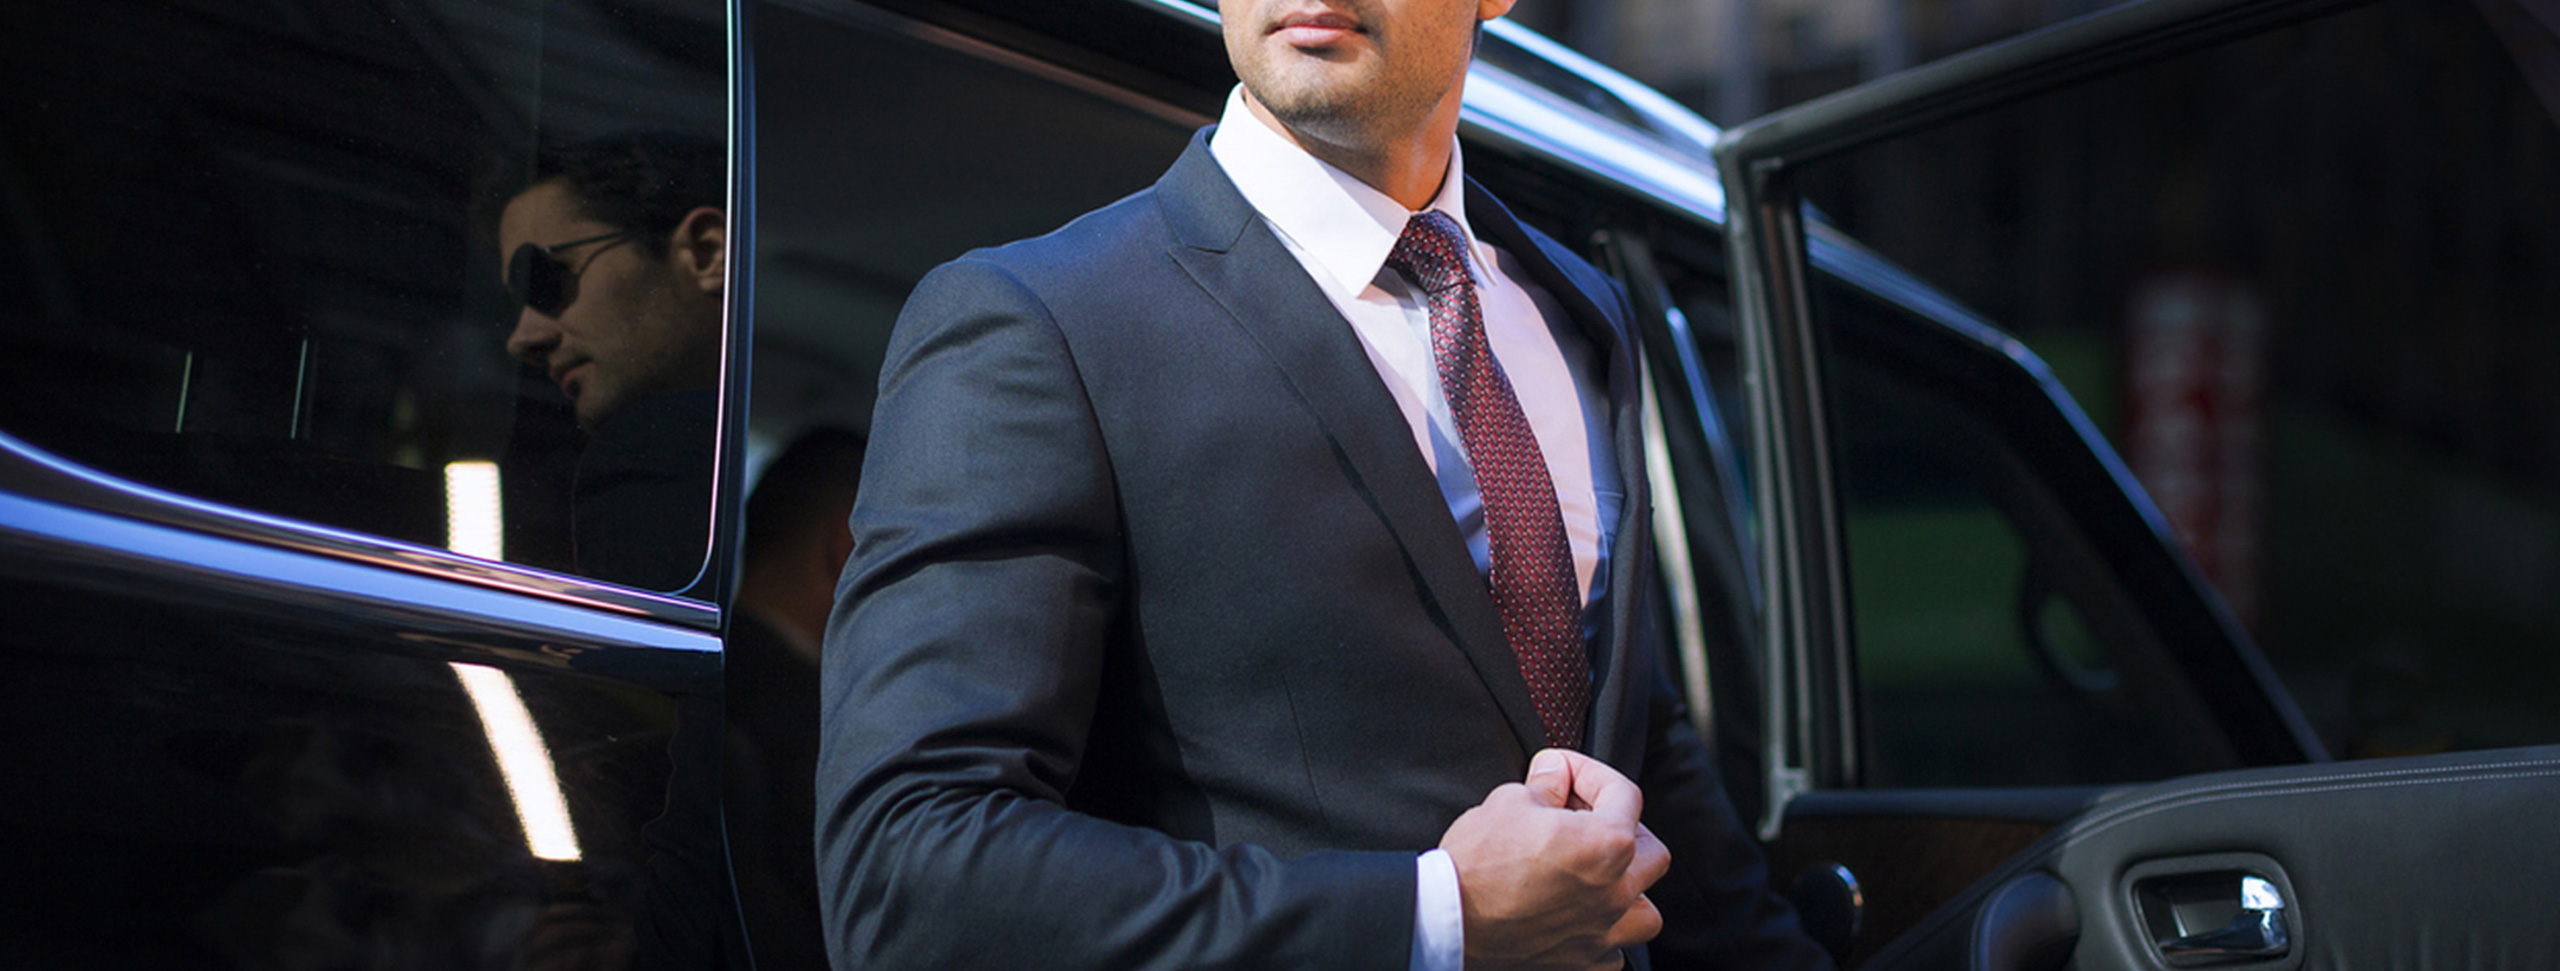 man in suit - prestige limousines